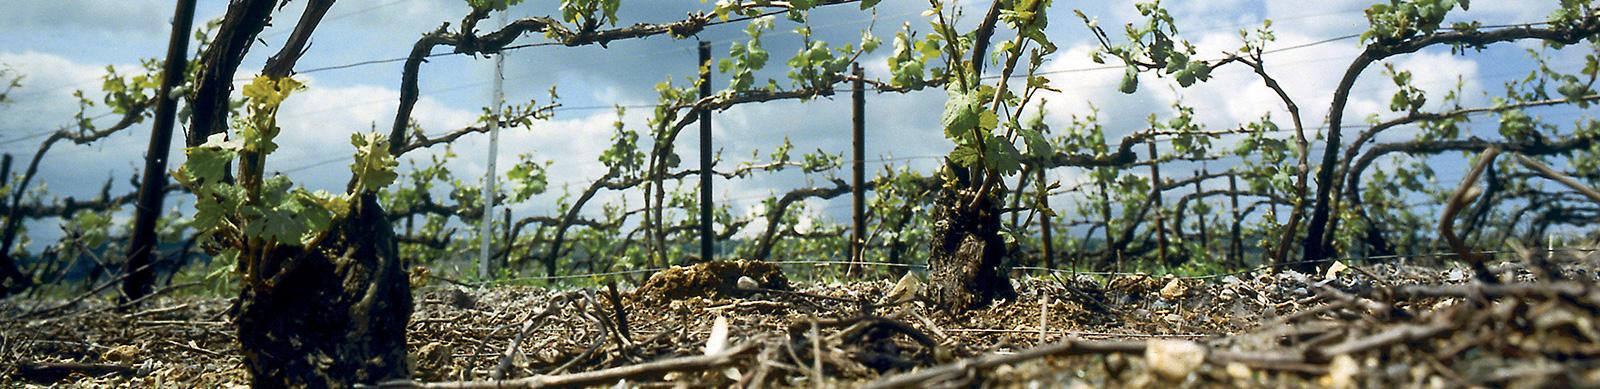 Vignoble Champenois